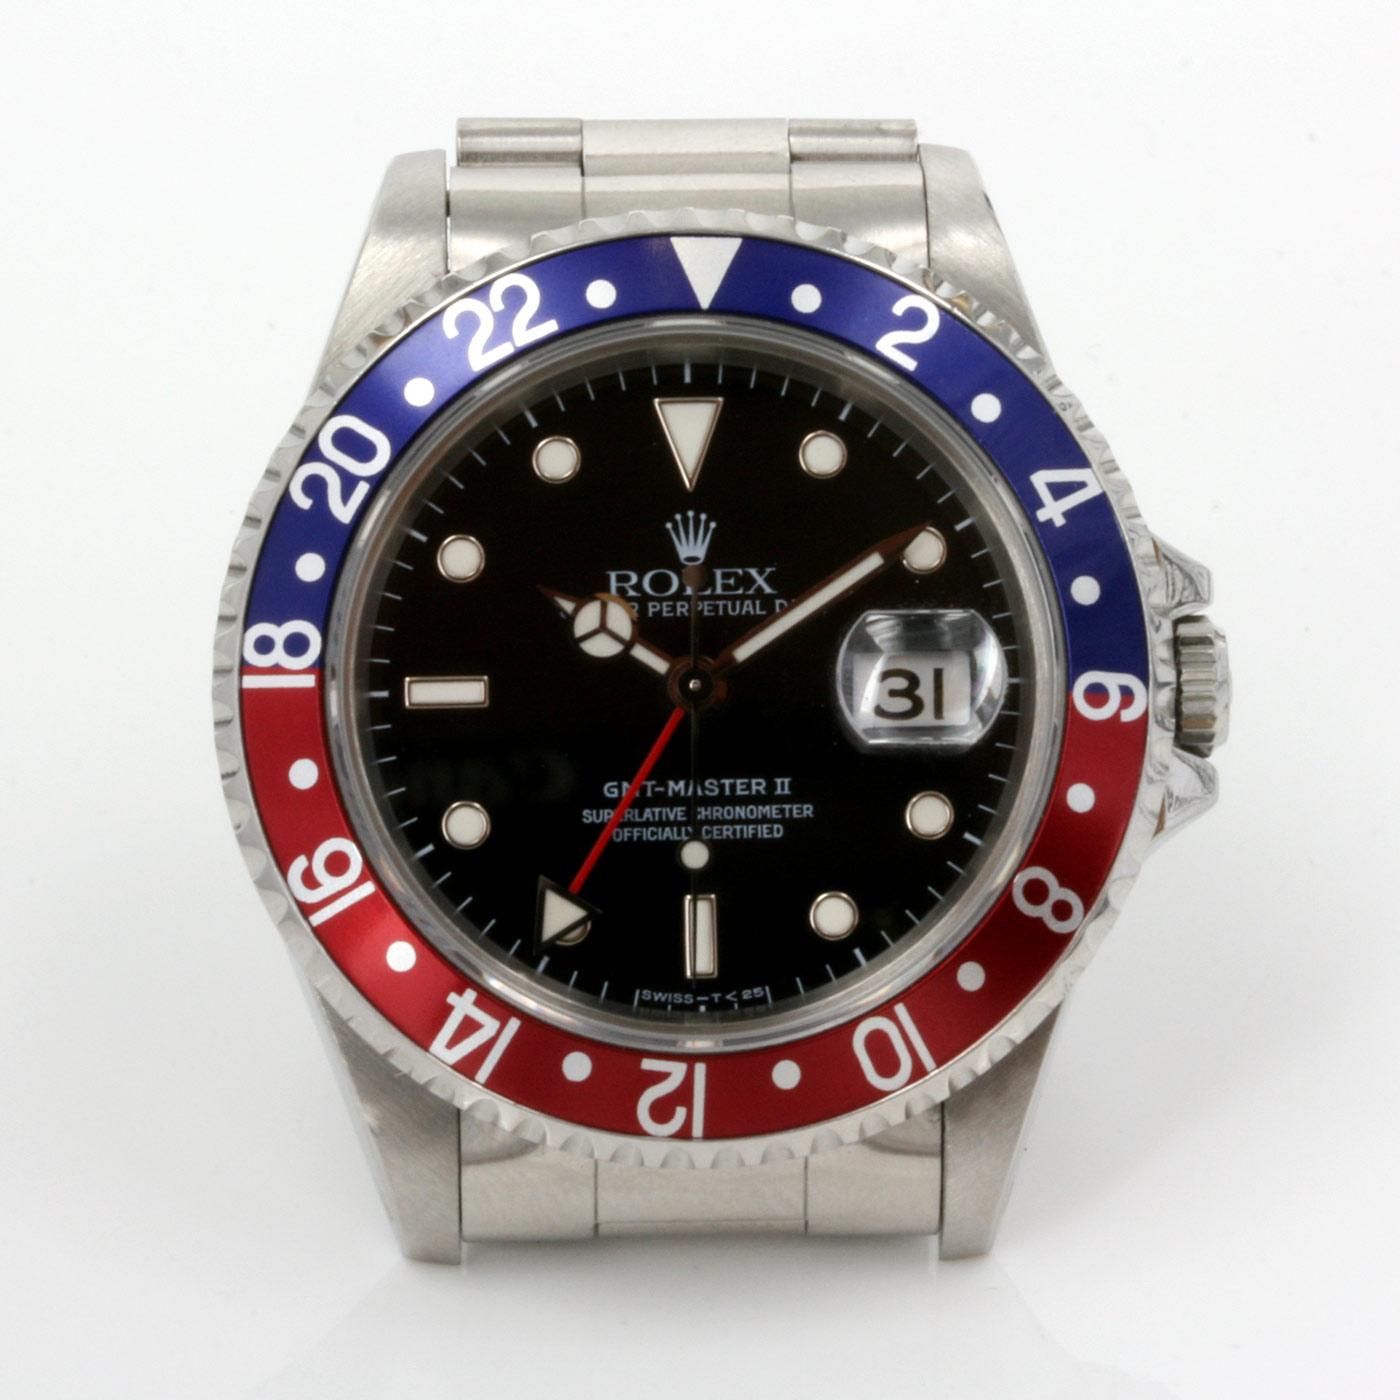 Rolex date in Sydney